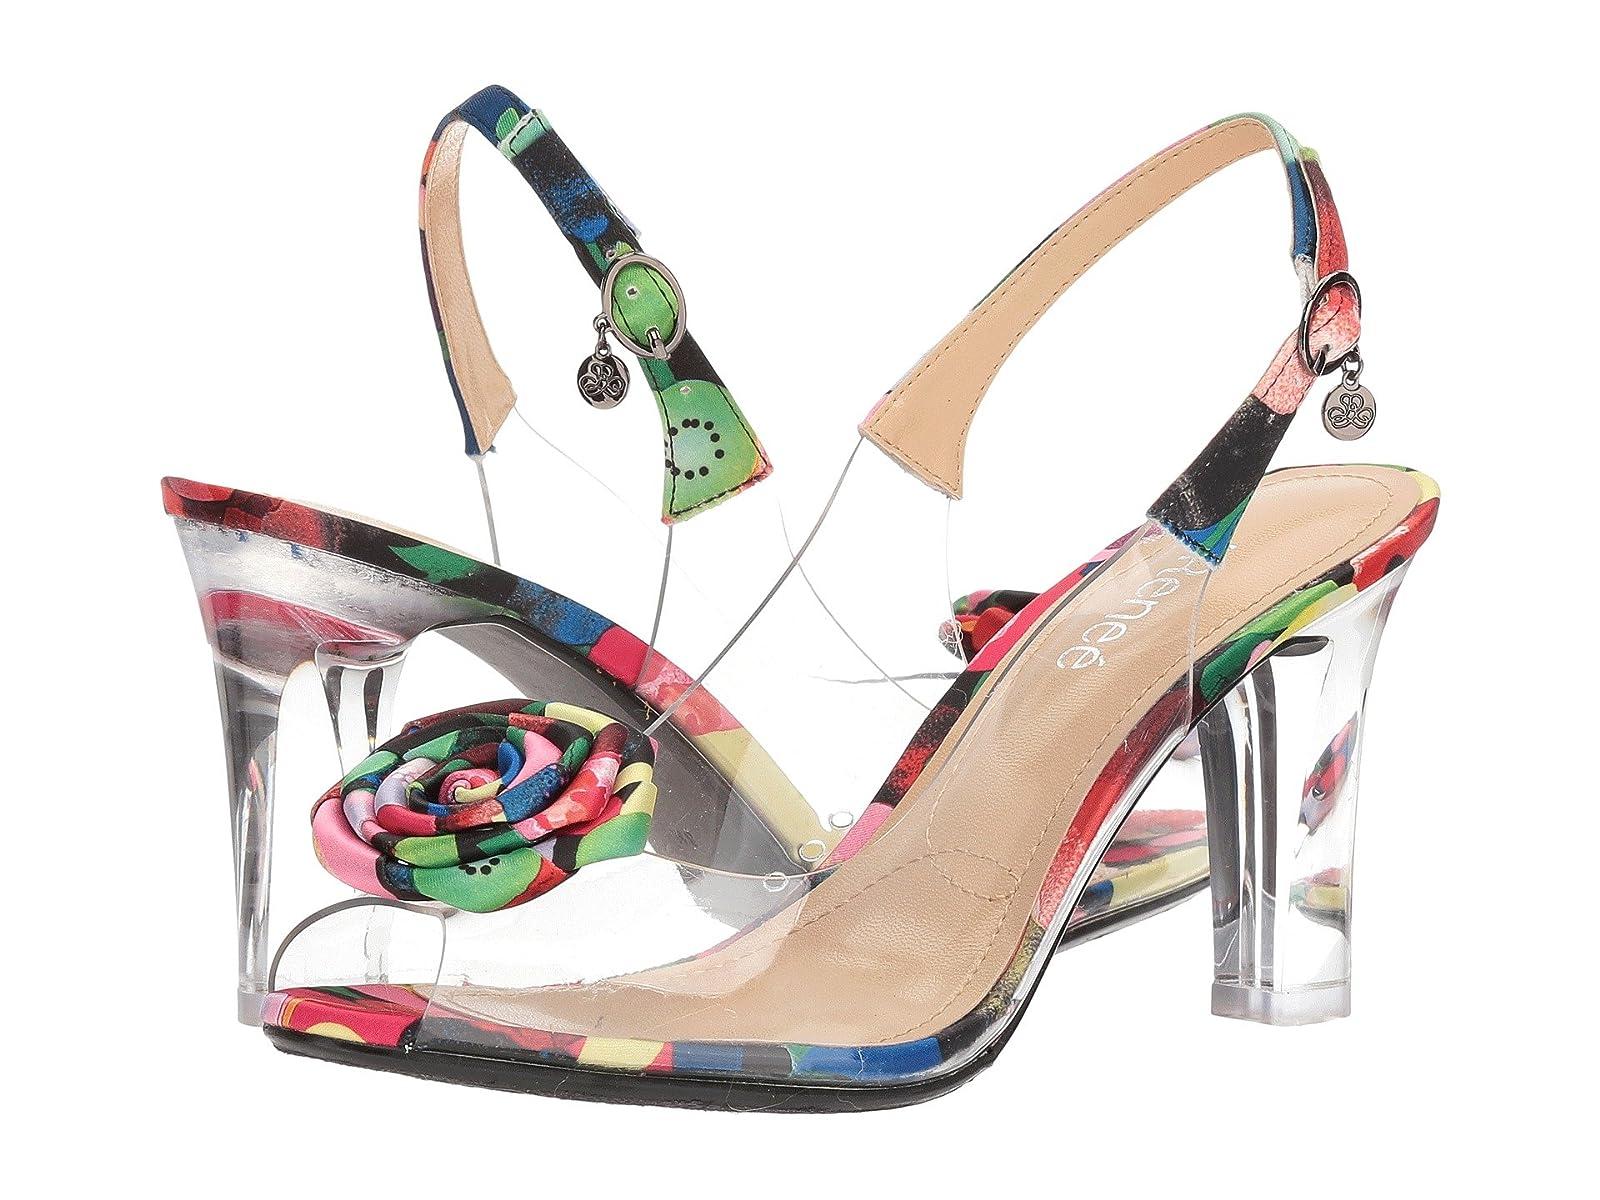 J. Renee AdoracionAtmospheric grades have affordable shoes